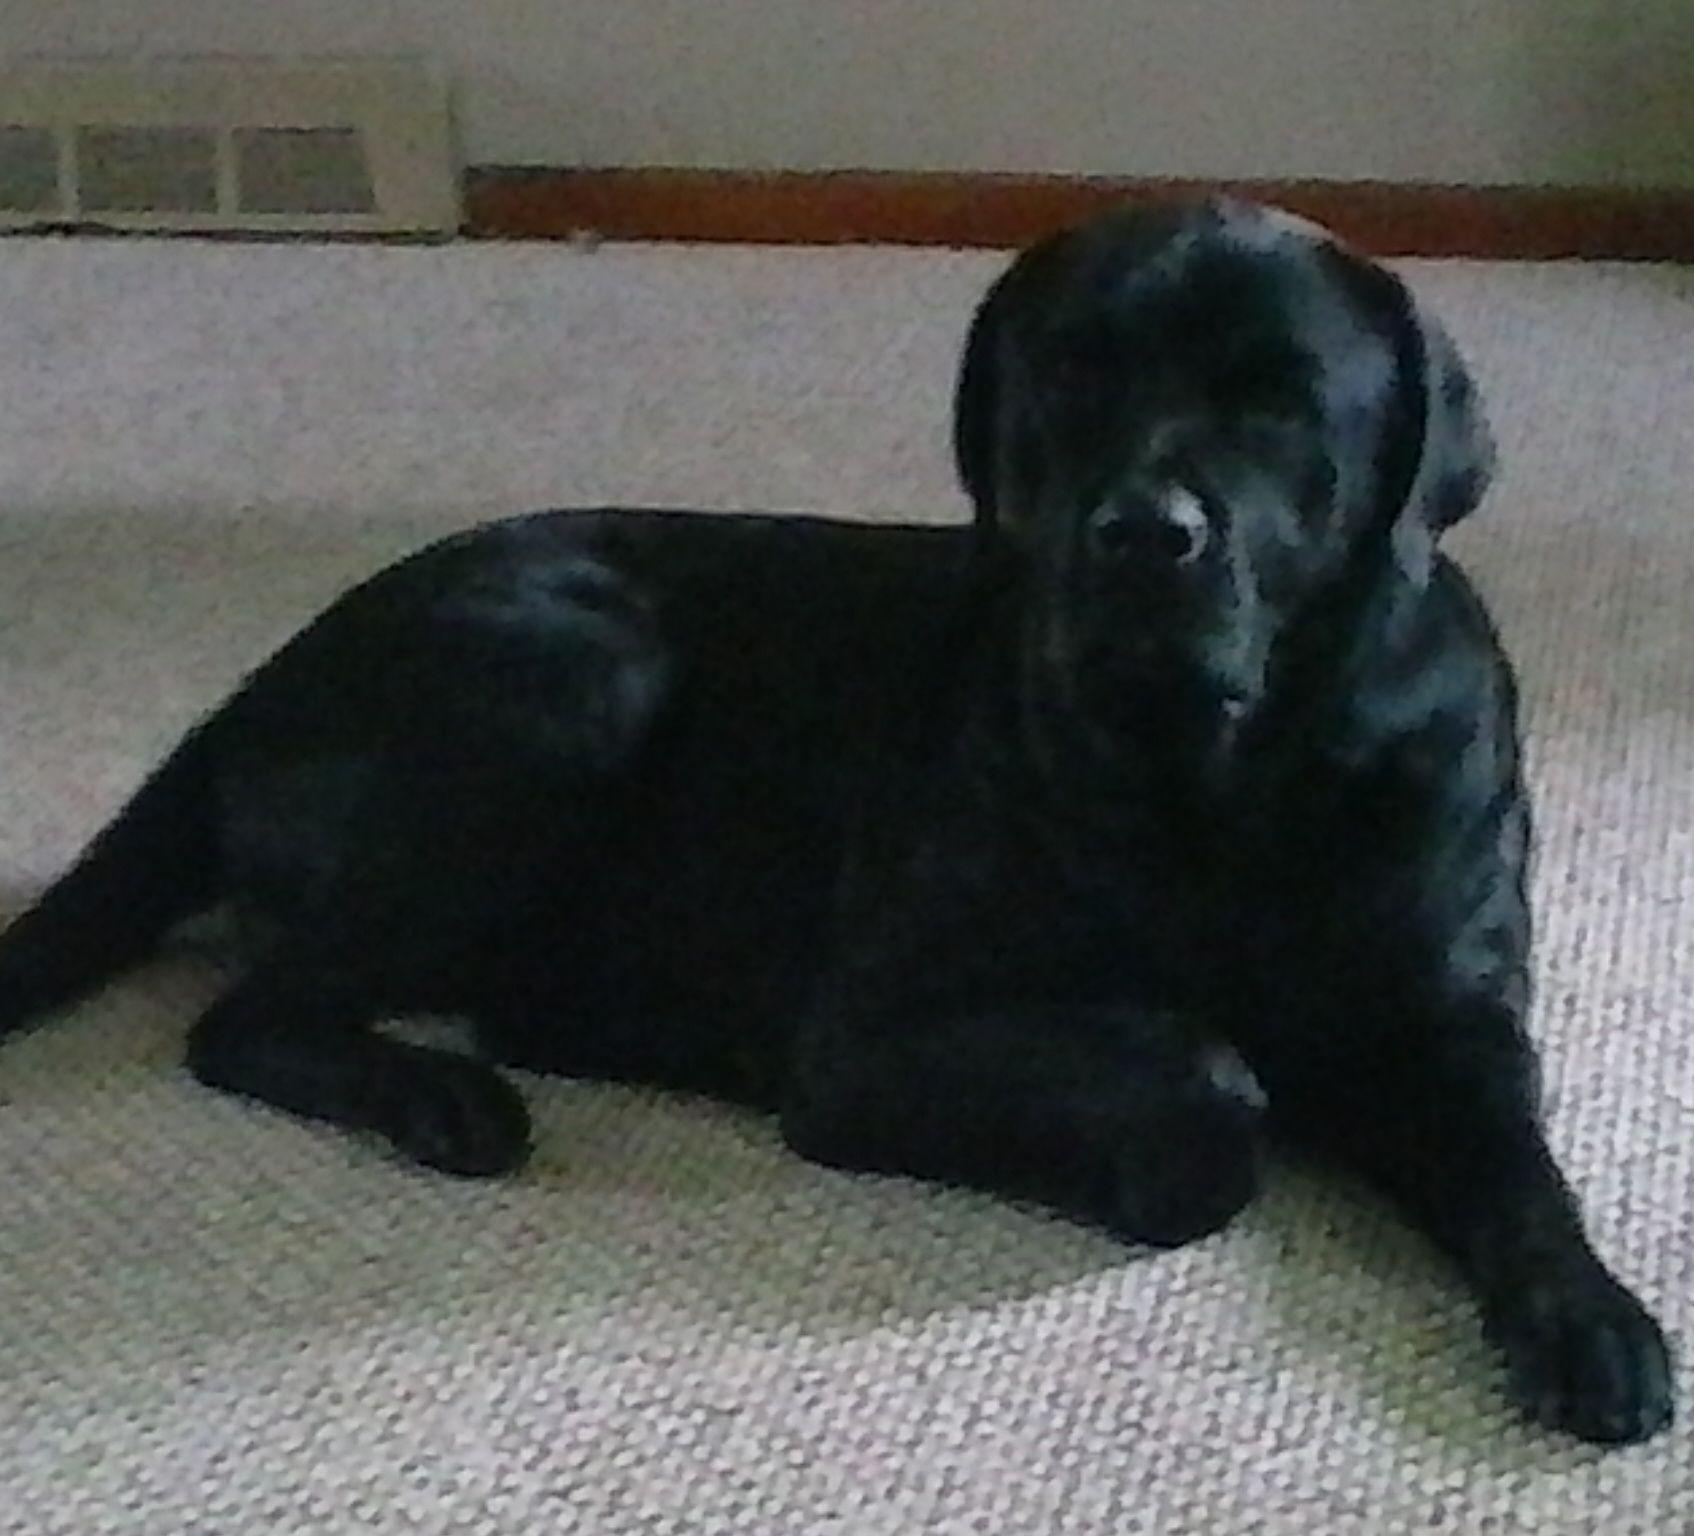 Lost Dog - Labrador Retriever - Monroeville, OH, United States 44847